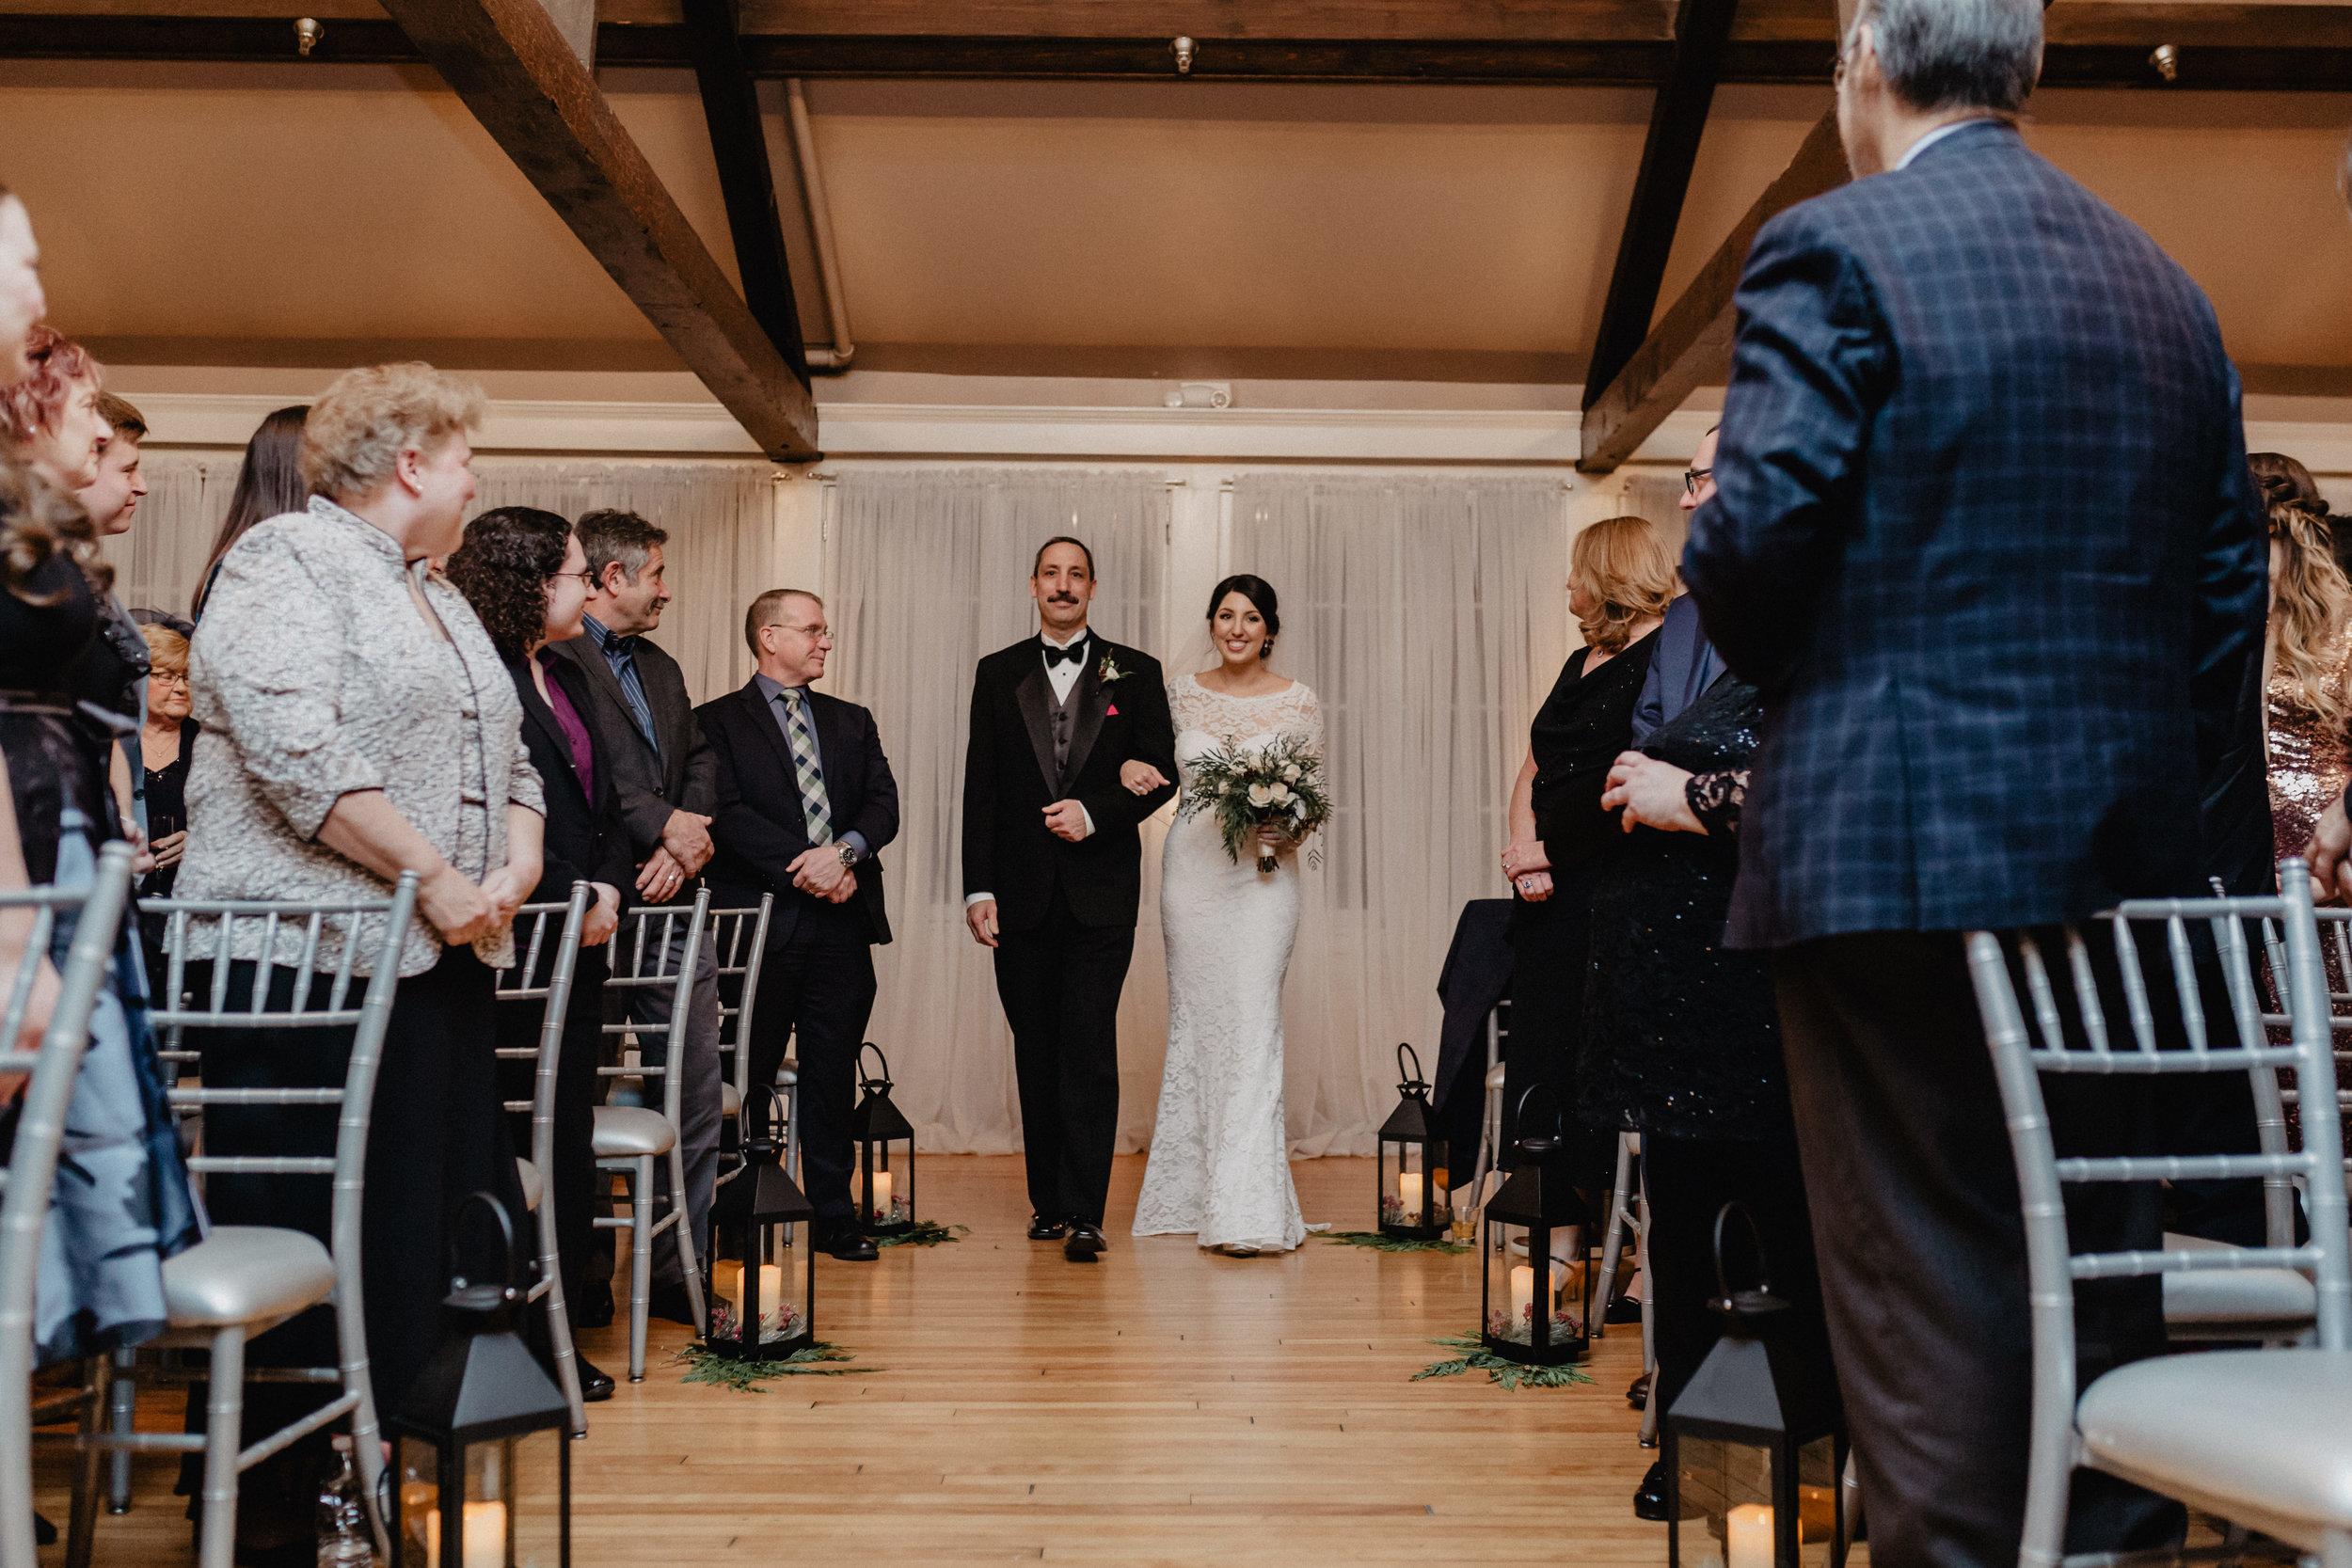 old_daley_on_crooked_lake_wedding_045.jpg